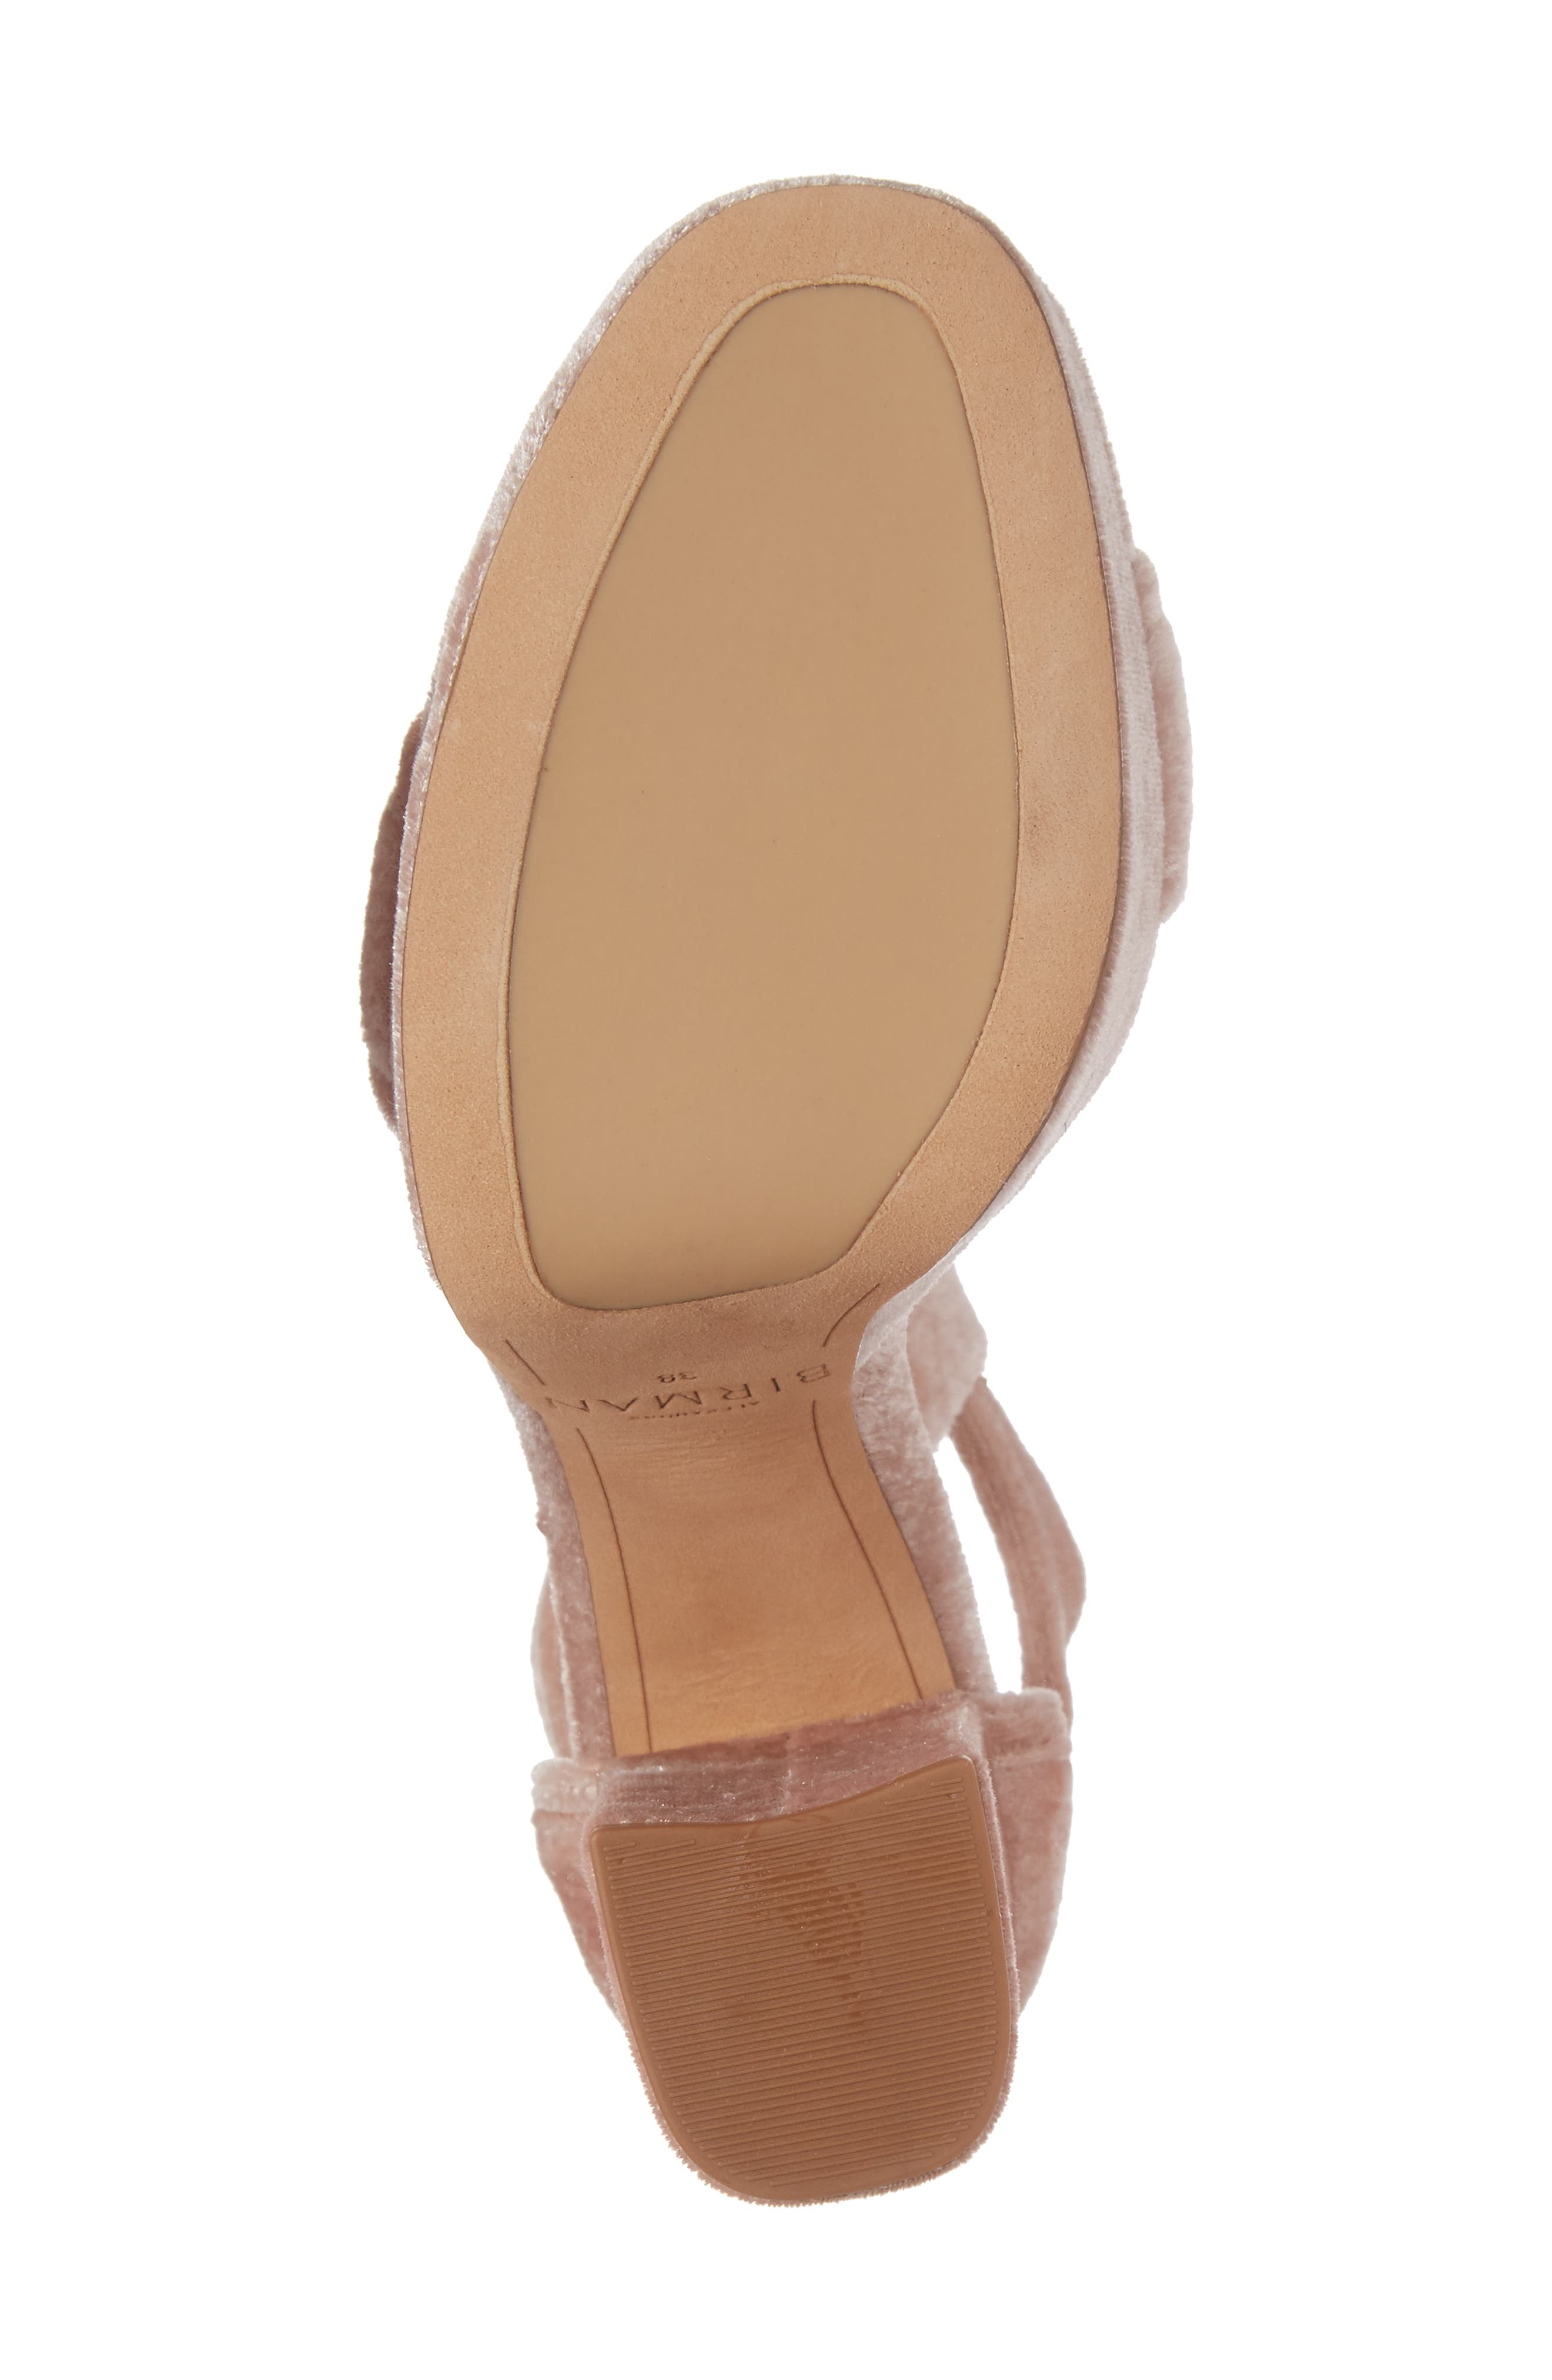 Celine Platform Sandal,                             Alternate thumbnail 5, color,                             Blush